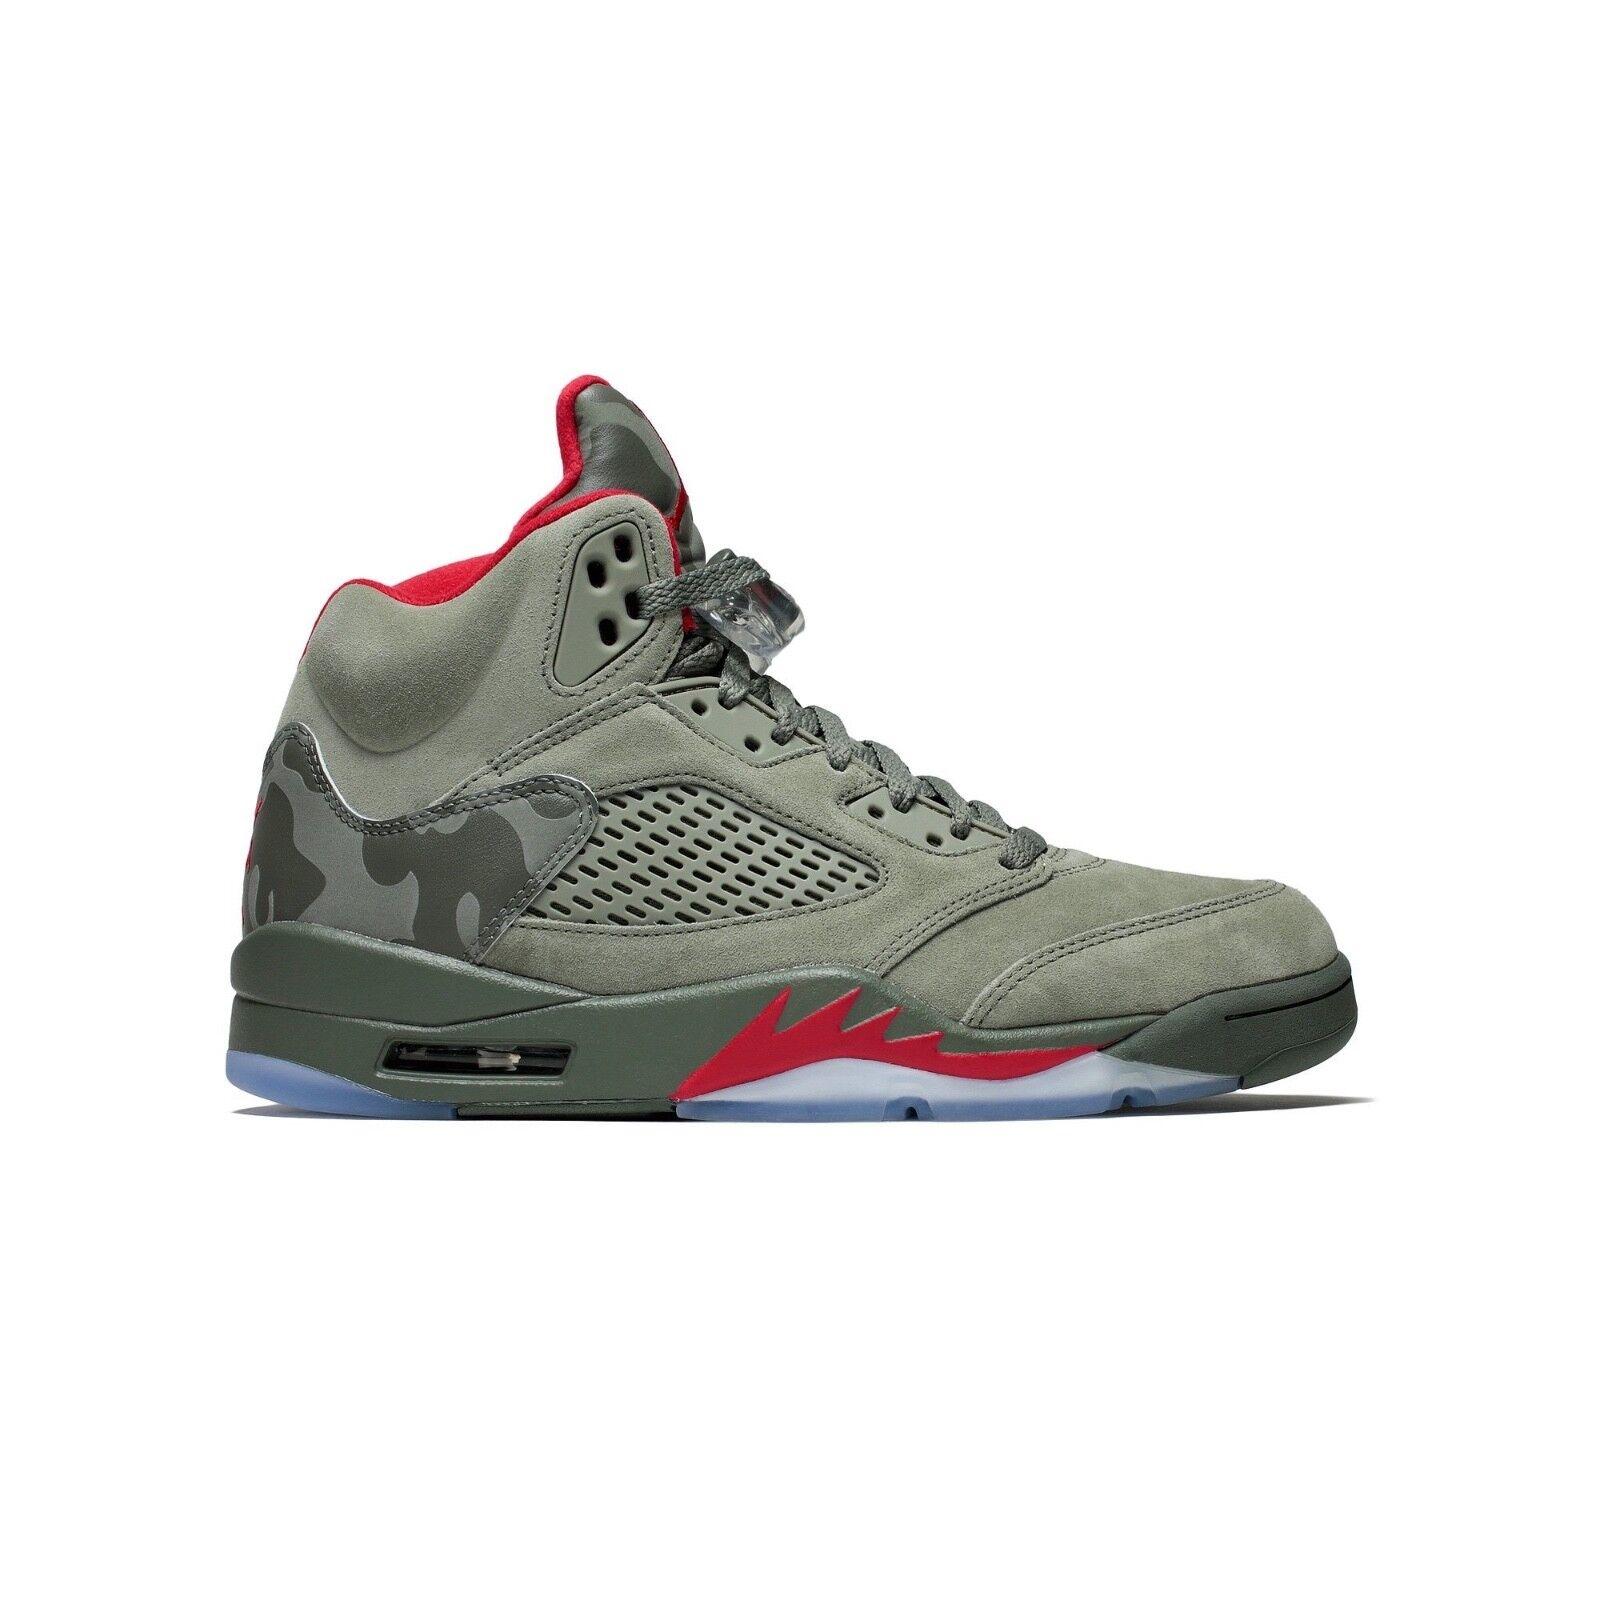 Hombre Nike Air Jordan Retro 5 Camo Air Nike Athletic tenis informales de moda 136027 051 6a5d2b